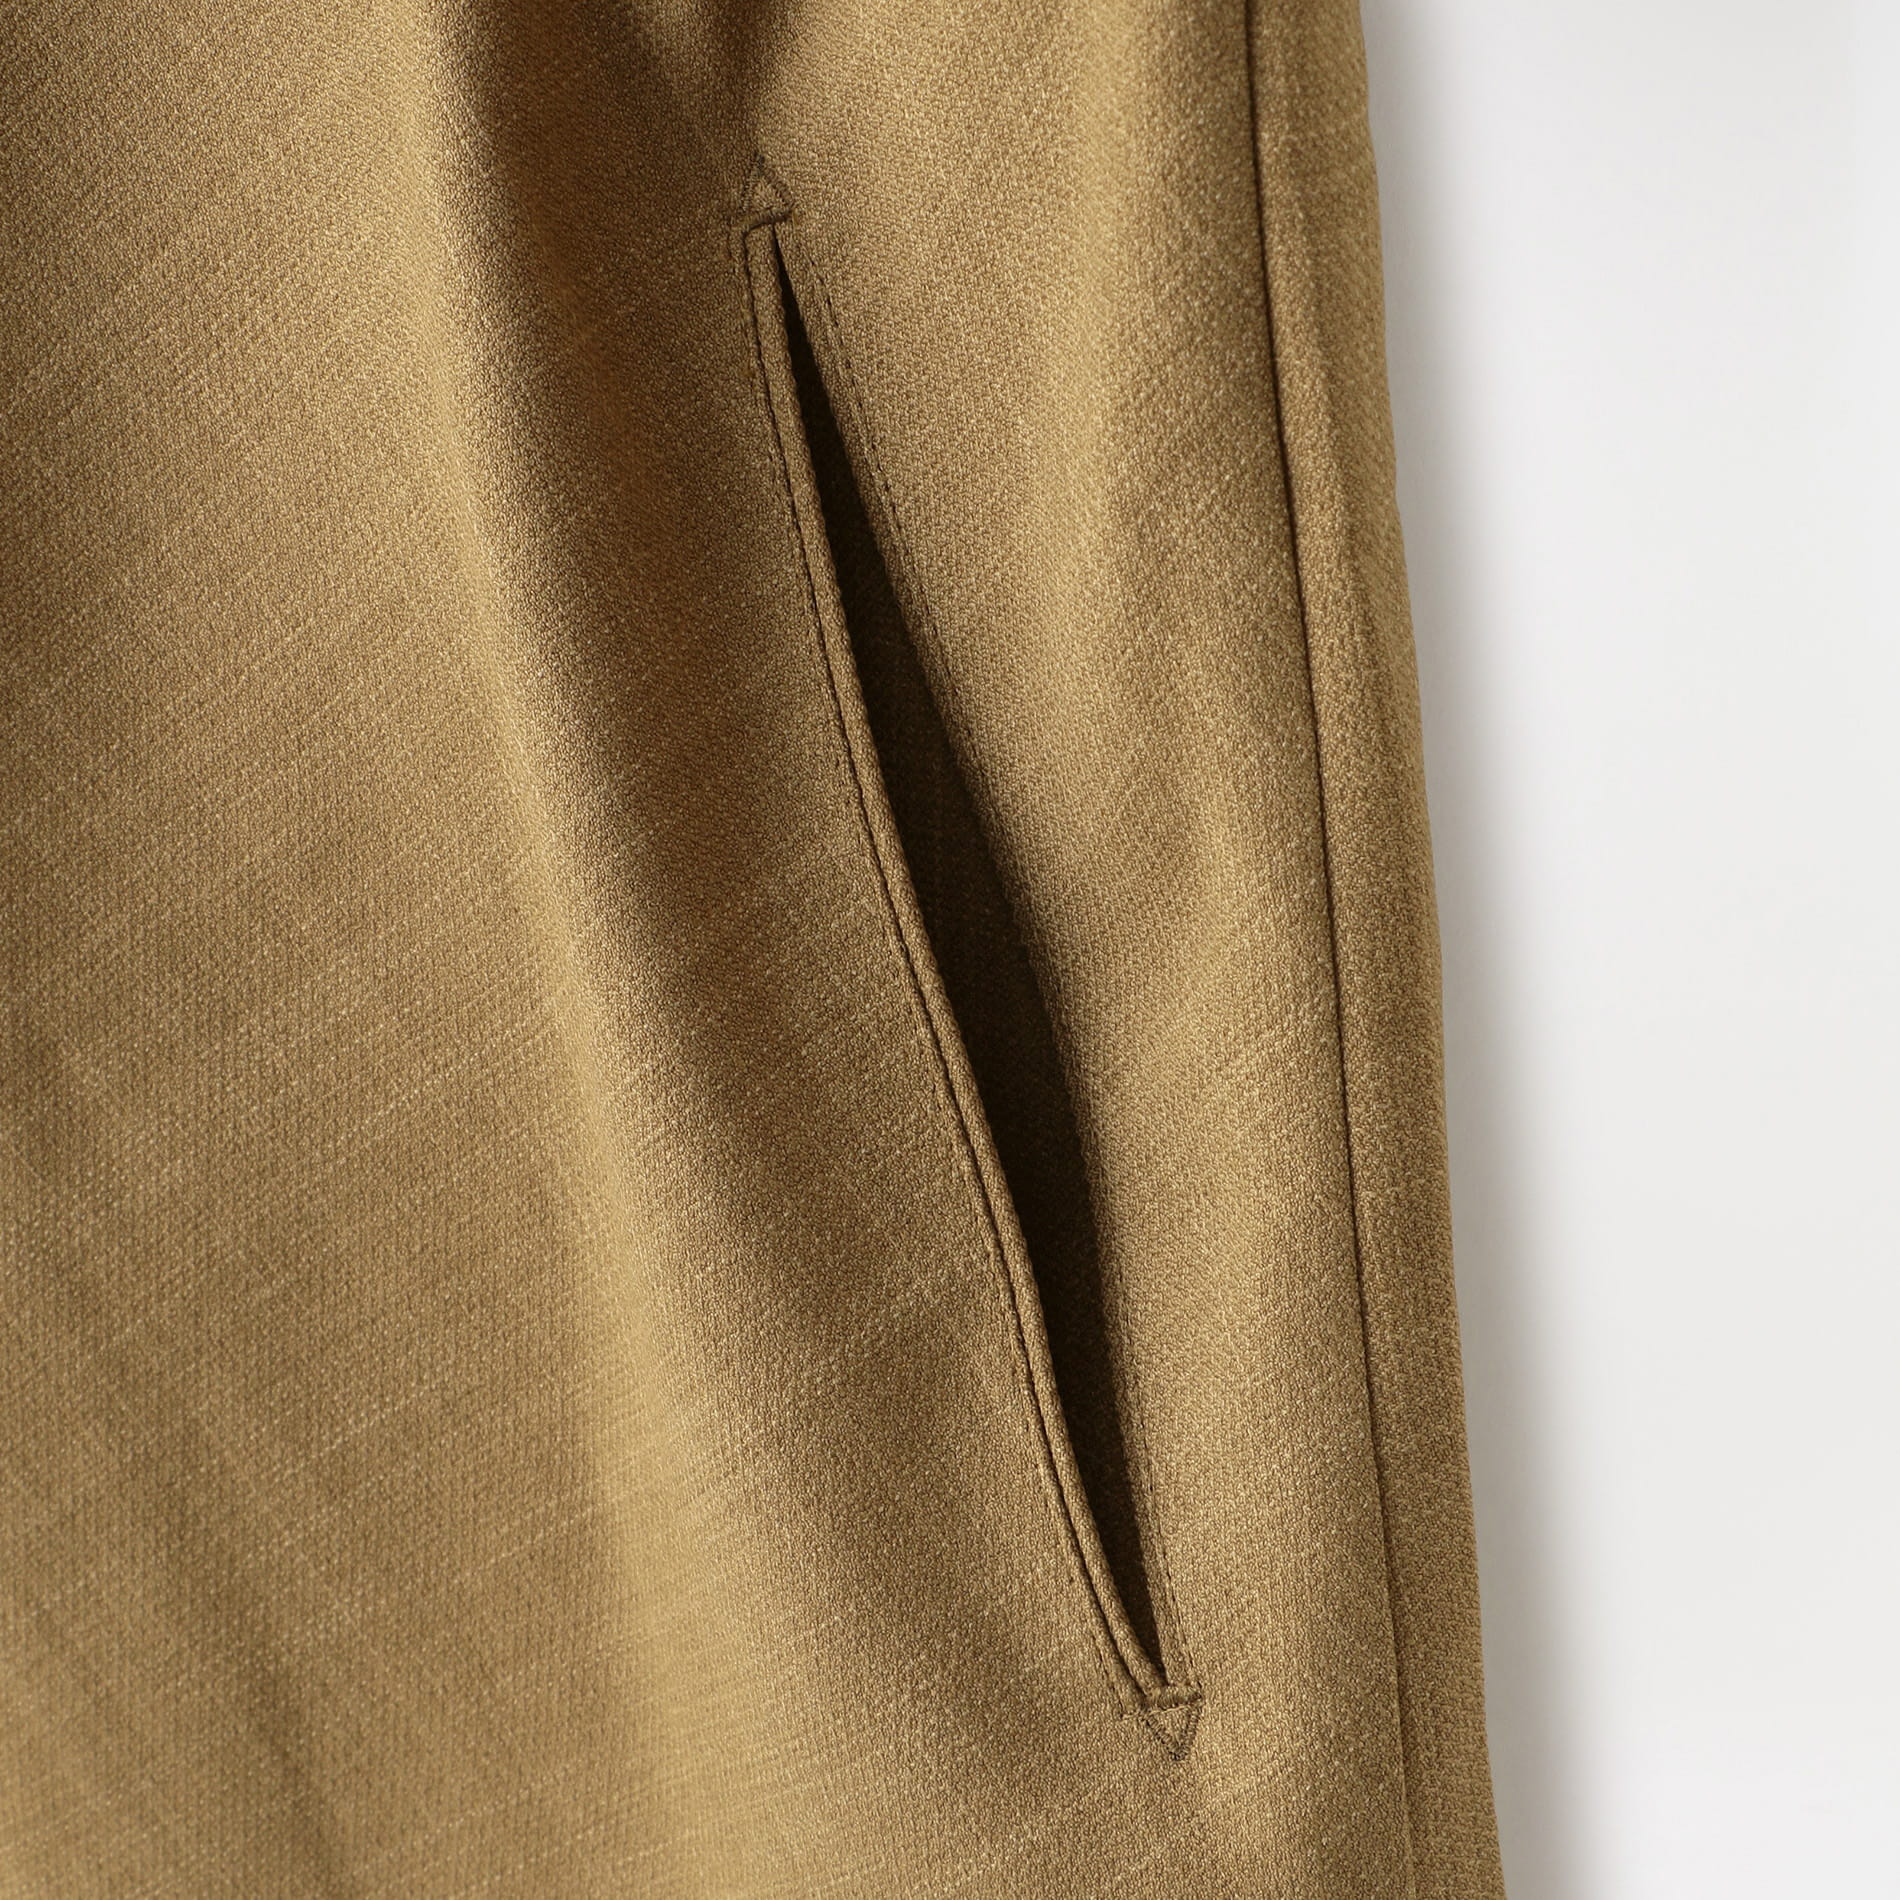 【Needles】WOMEN ジャケット Miles Jacket - Poly Dobby Twill IN040